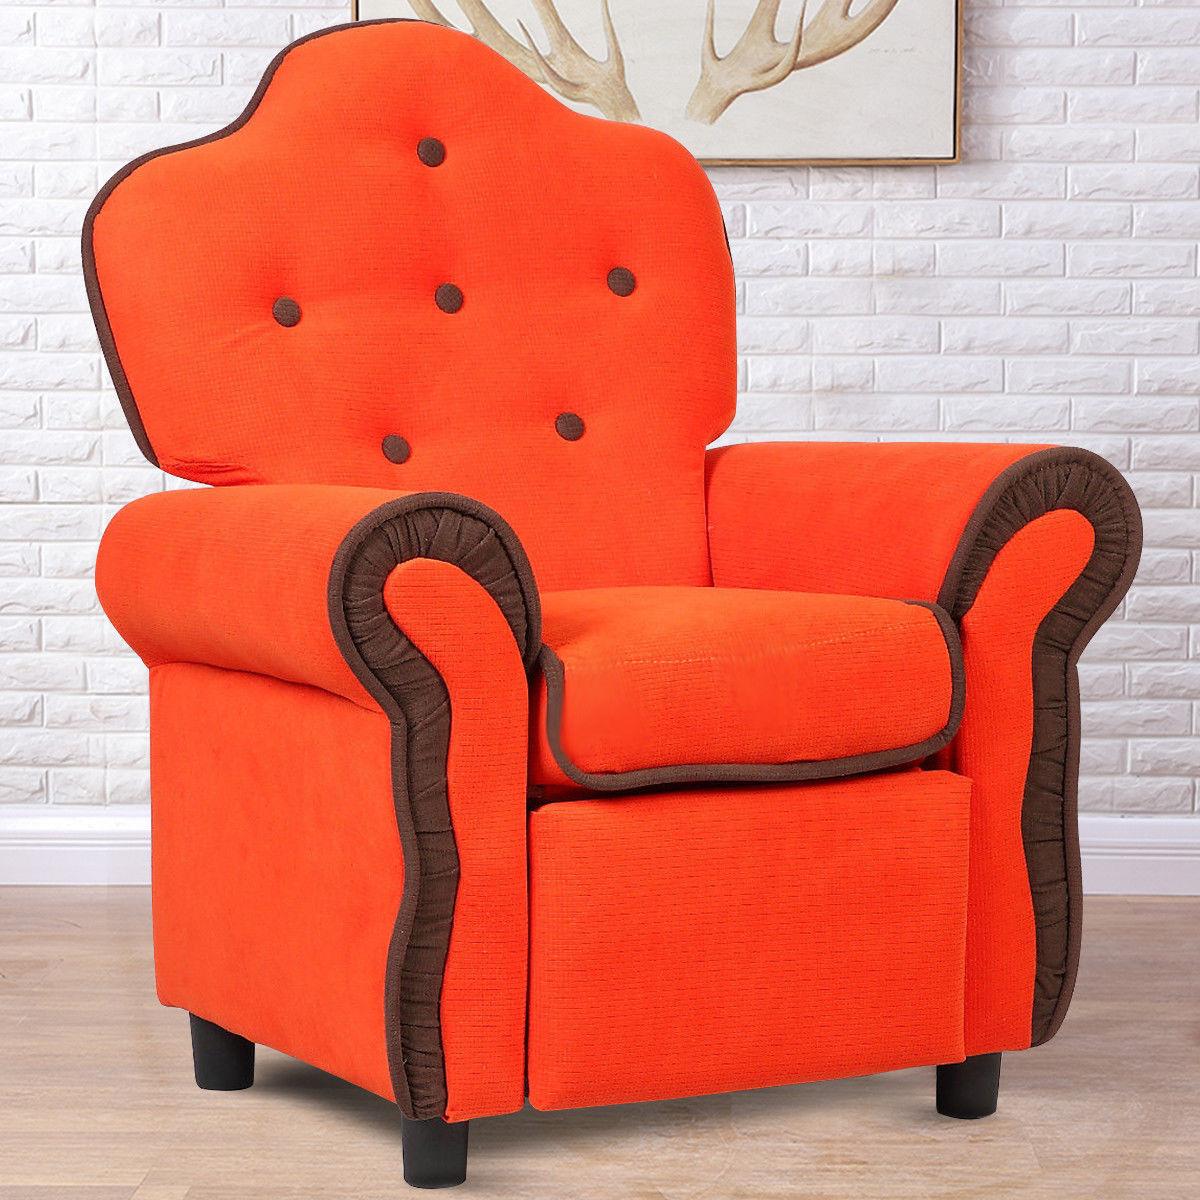 Children Recliner Kids Sofa Chair Couch Living Room Furniture Orange